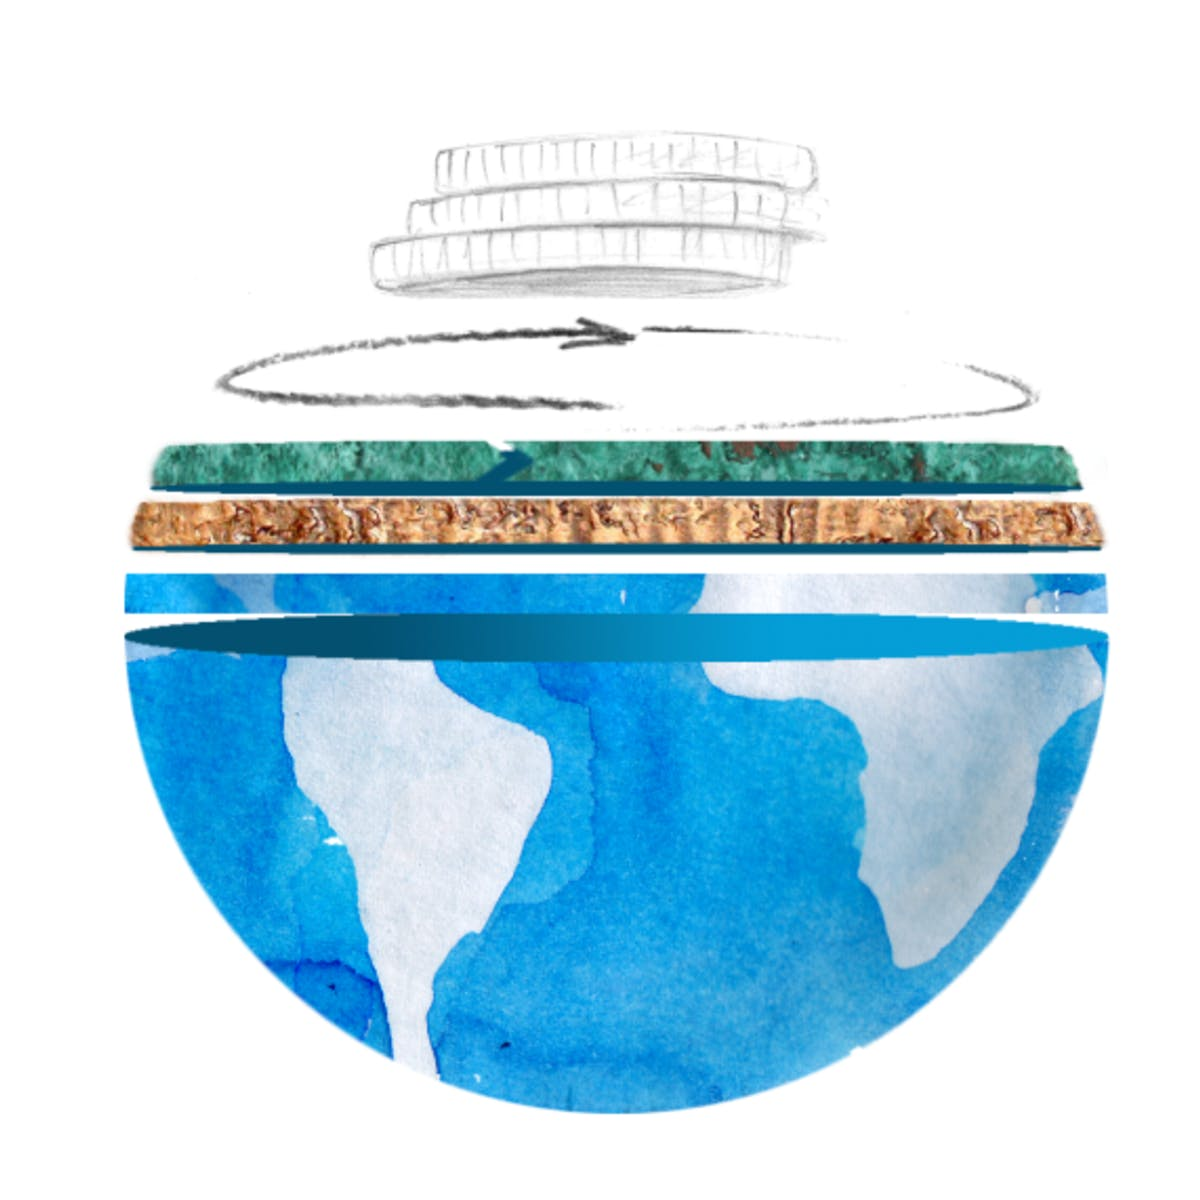 A Circular Economy of Metals: Towards a Sustainable Societal Metabolism